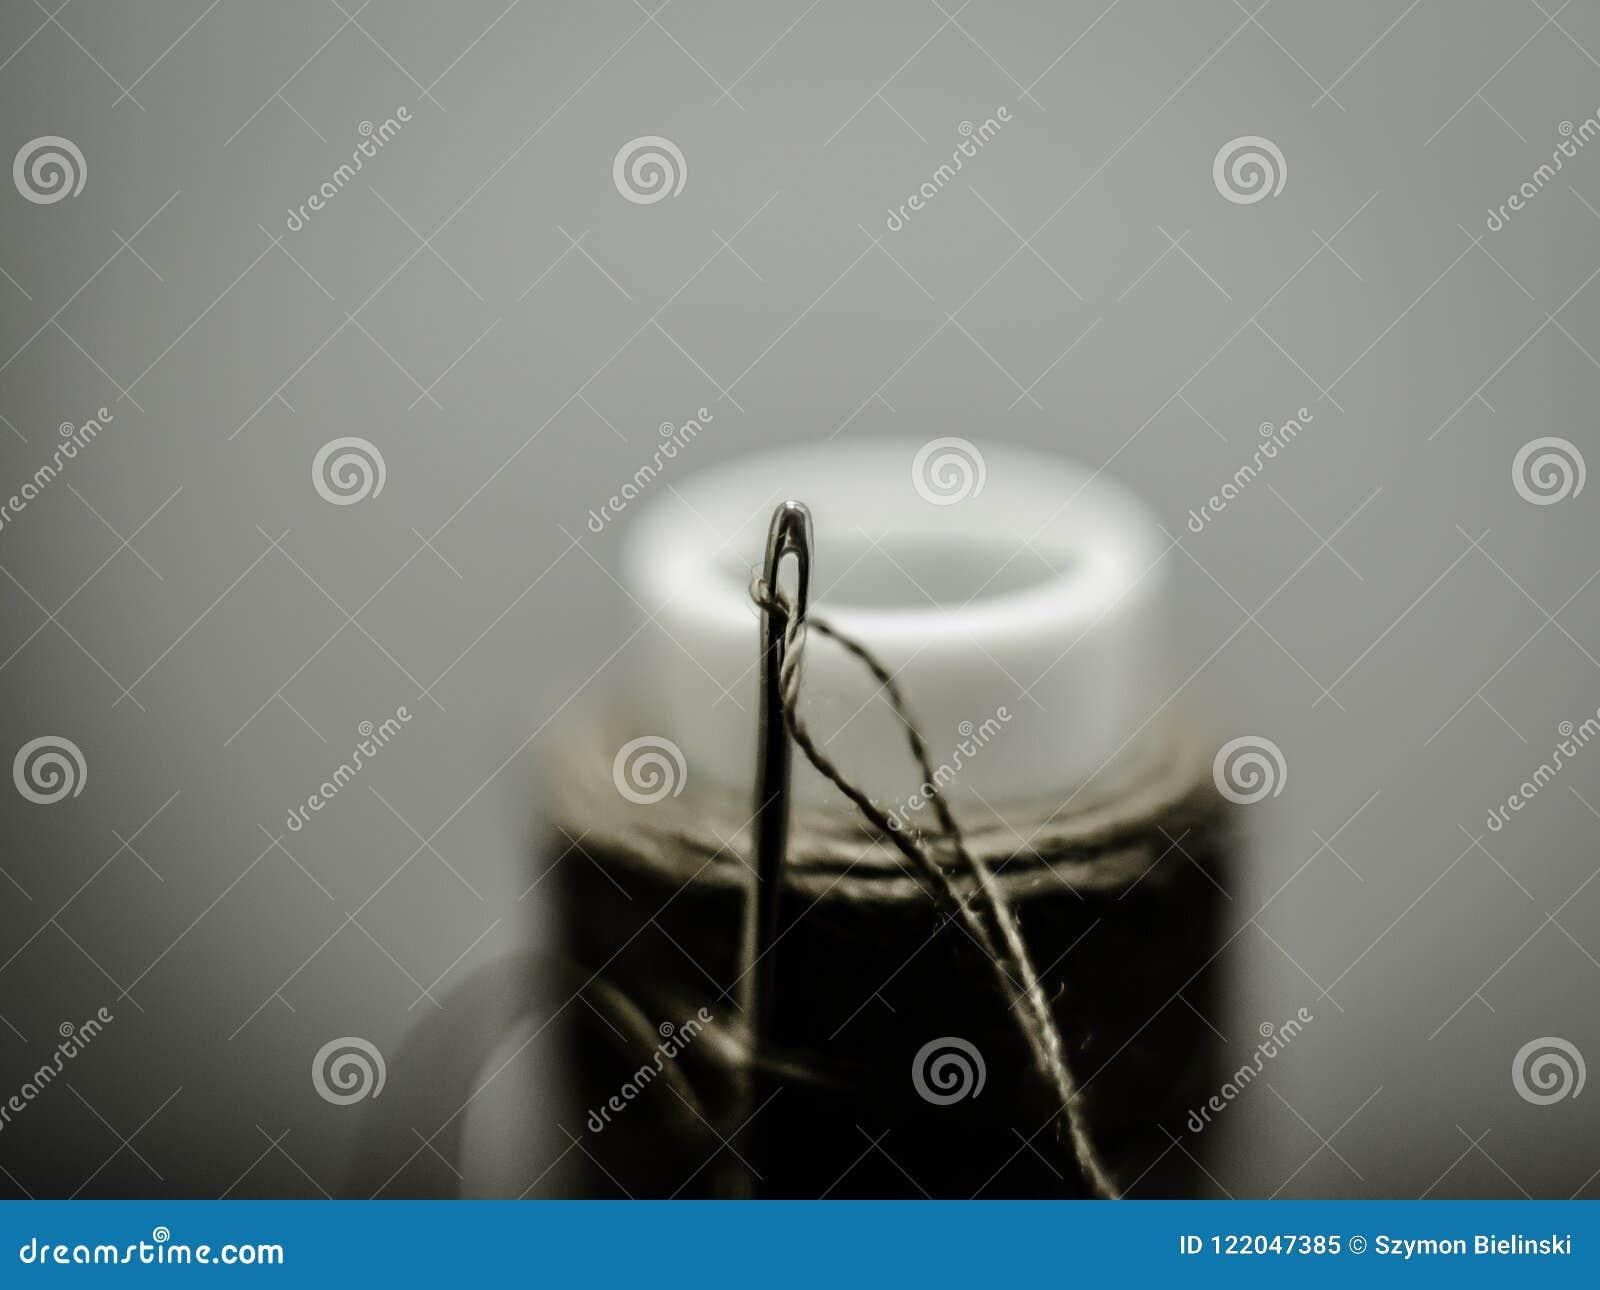 Una aguja de costura se pegó en un carrete del hilo en una escala macra